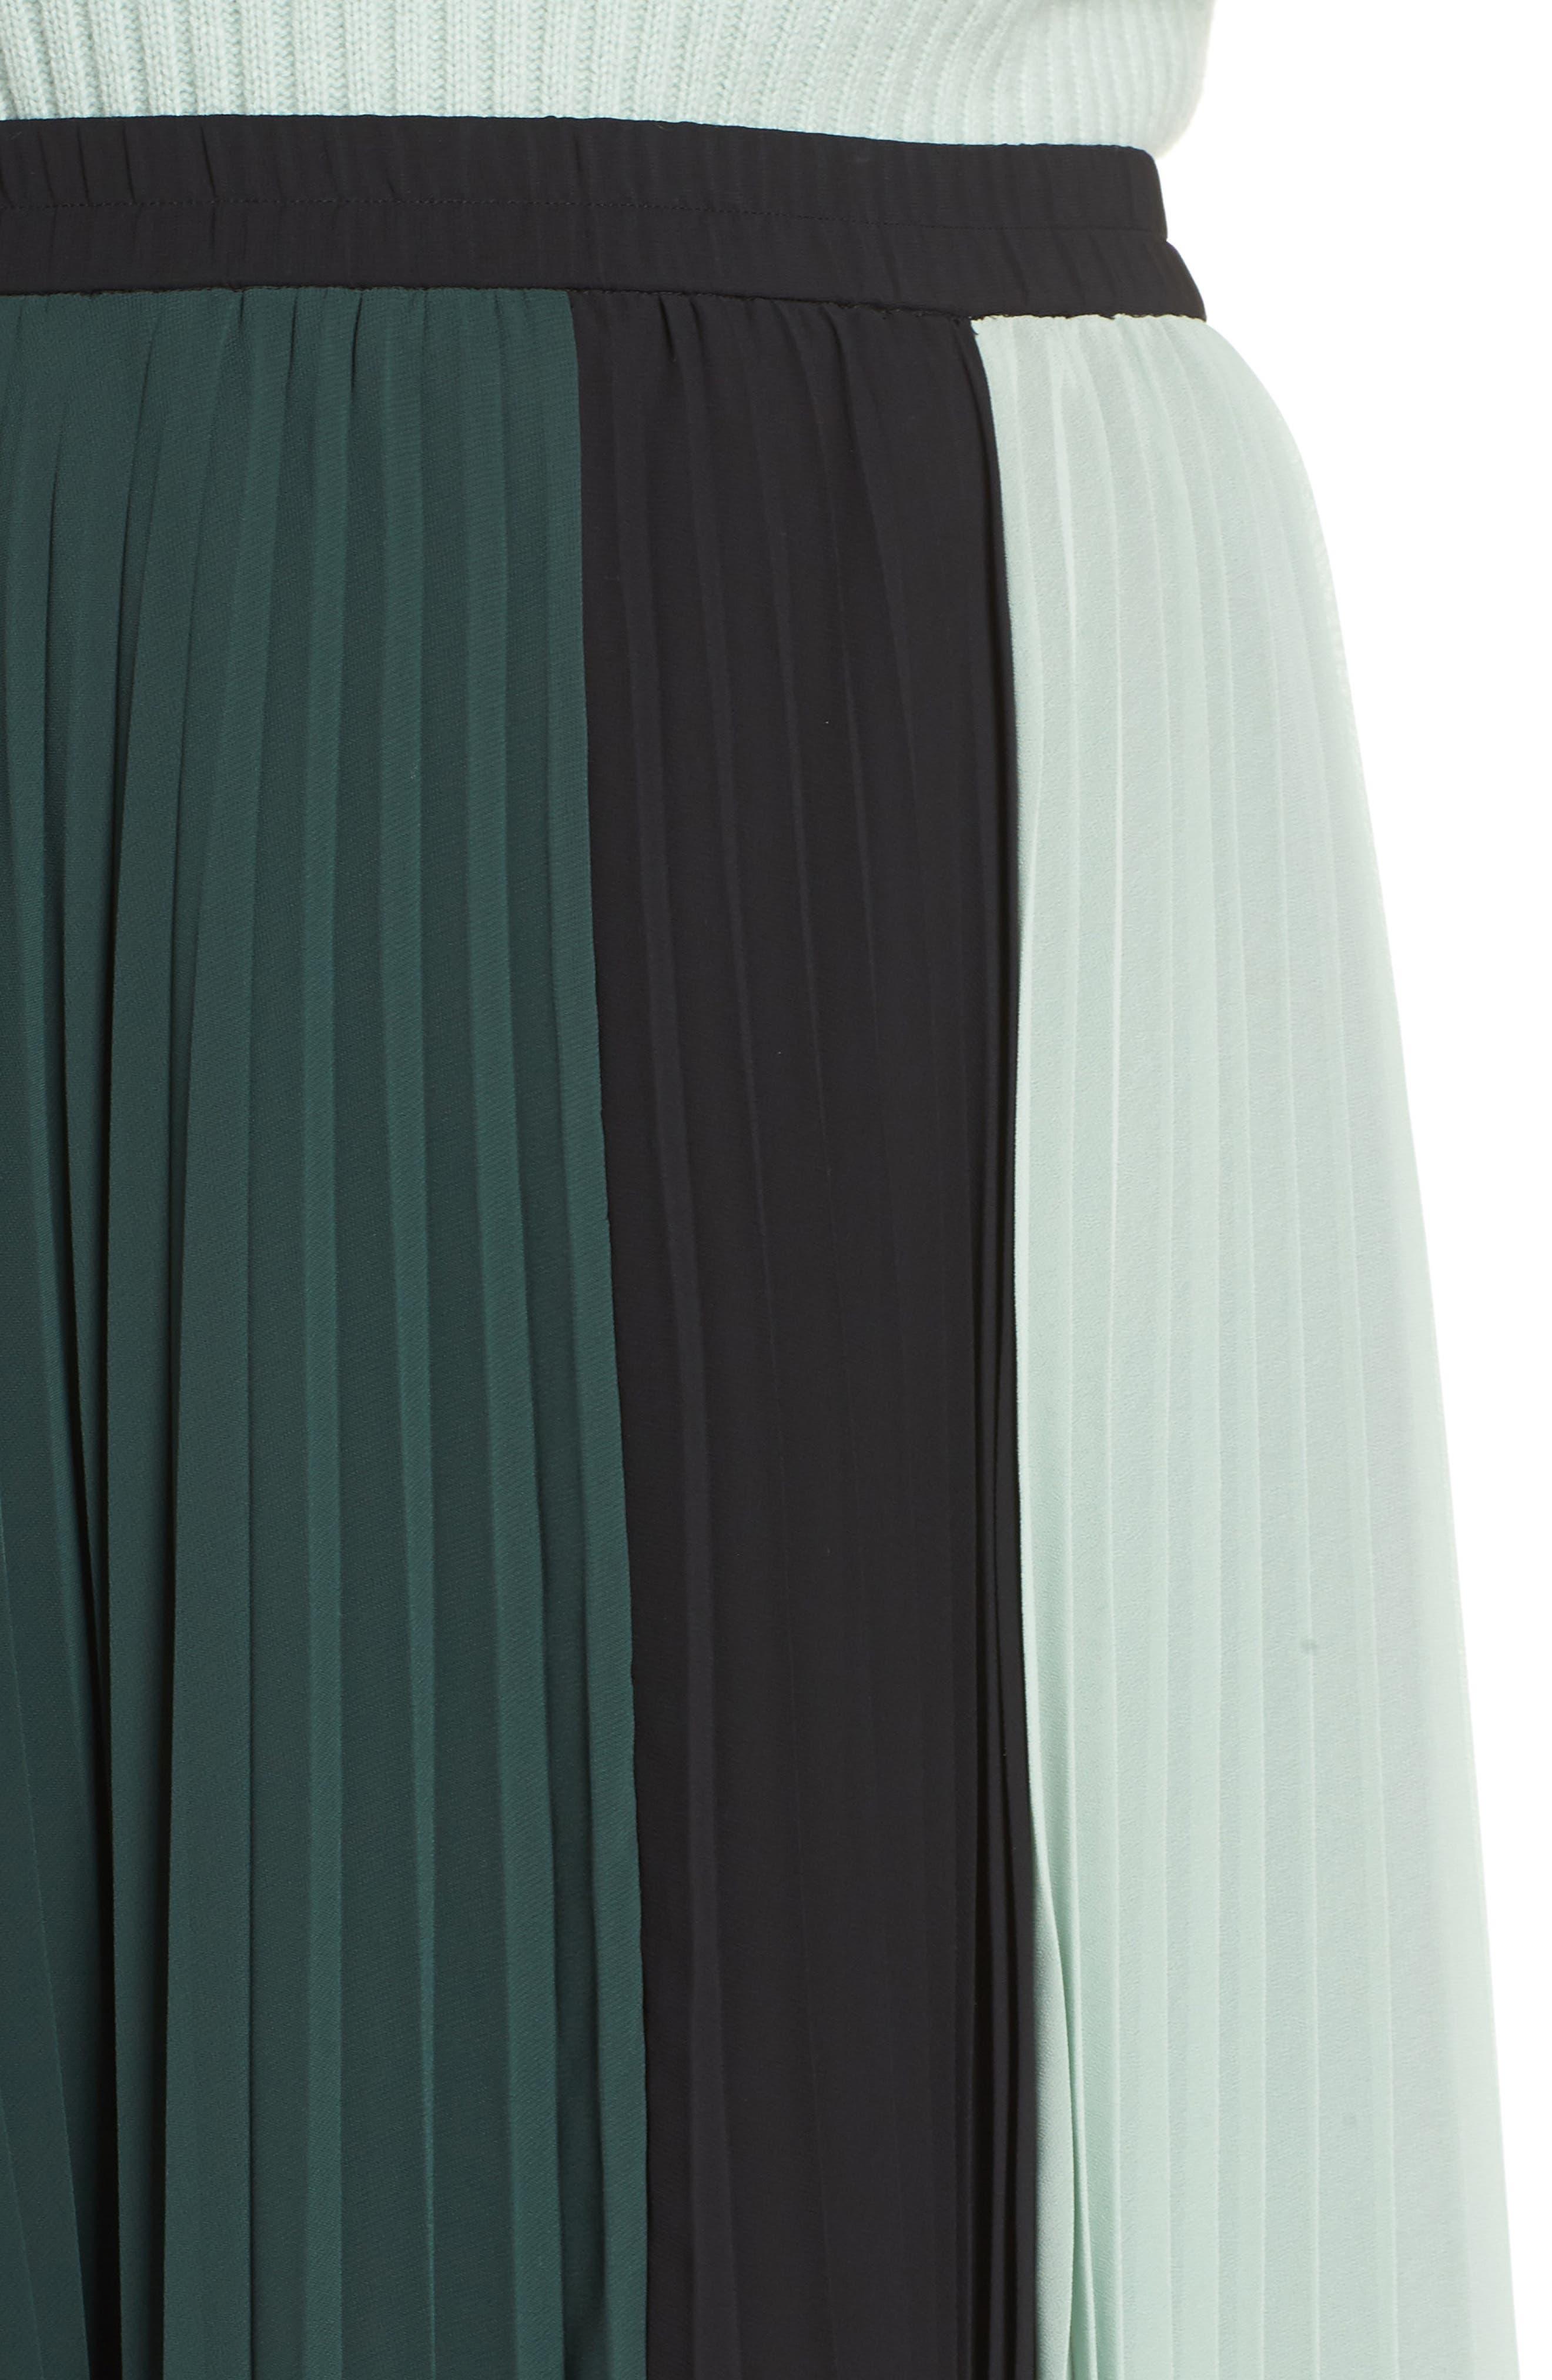 x Atlantic-Pacific Colorblock Pleated Midi Skirt,                             Alternate thumbnail 4, color,                             GREEN- BLACK COLORBLOCK